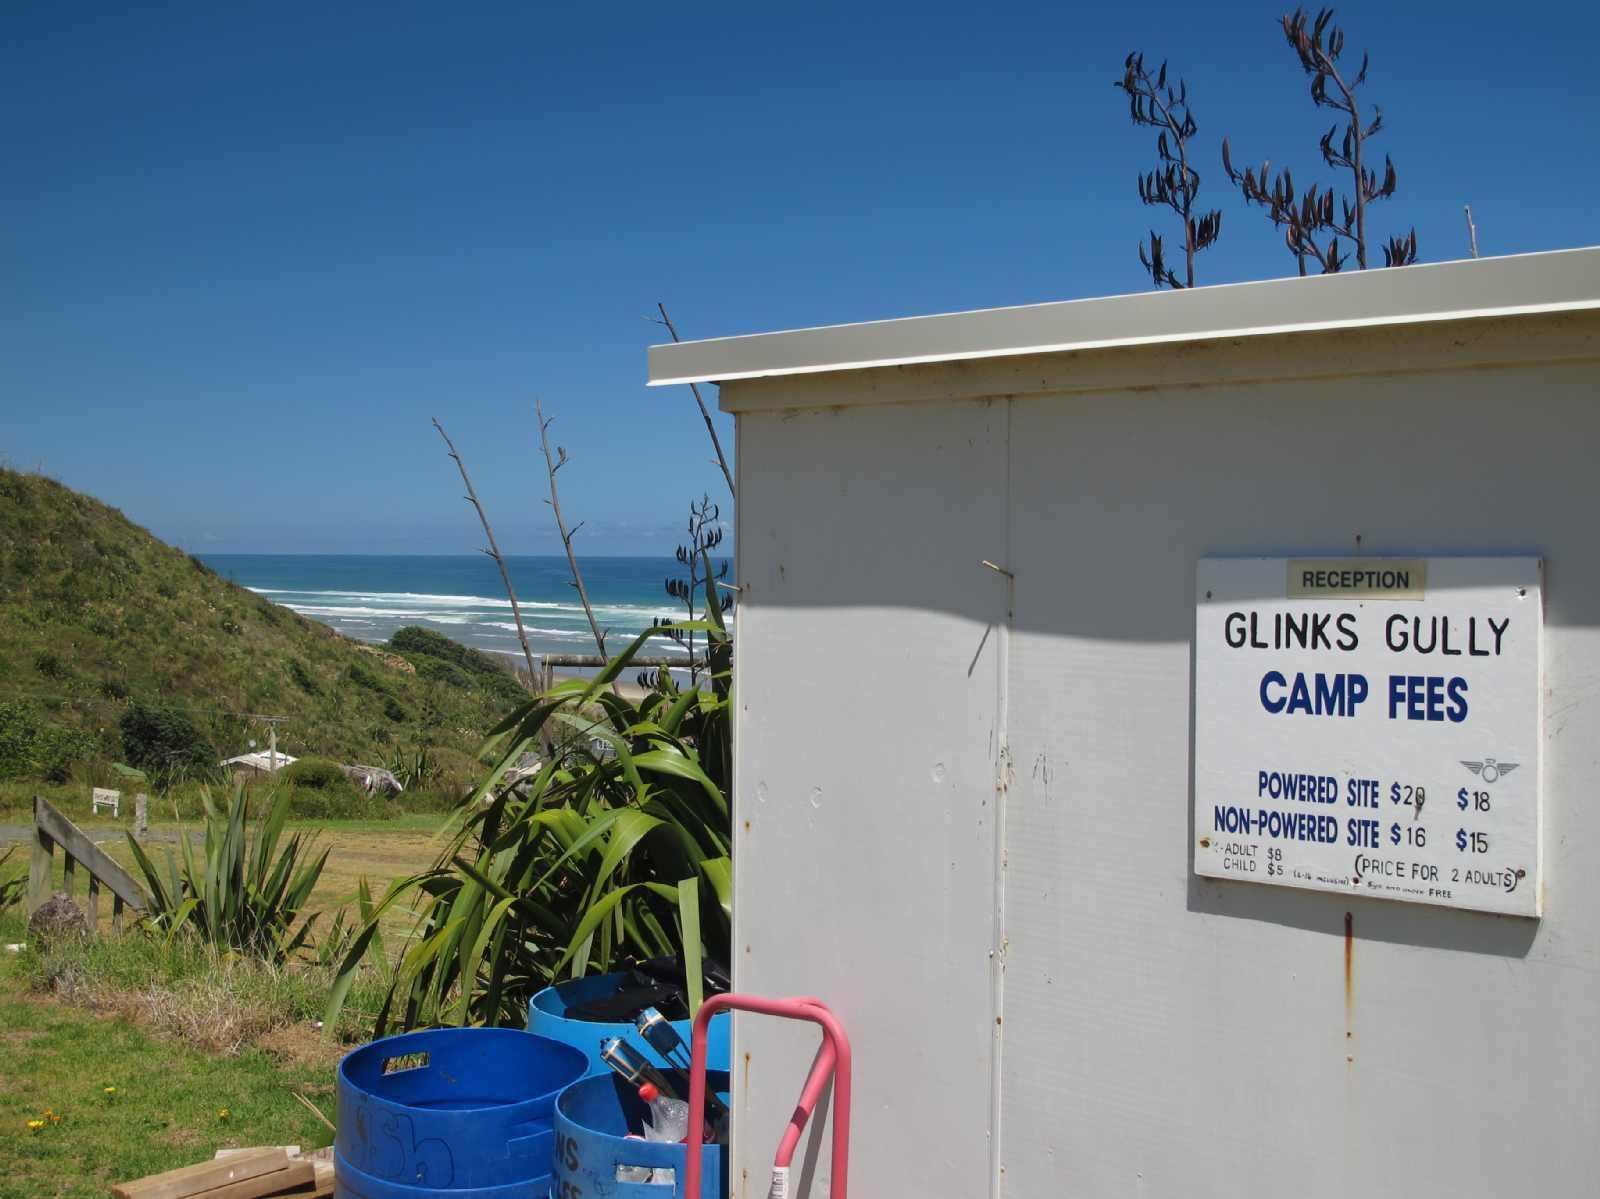 Glinks Gully Campground